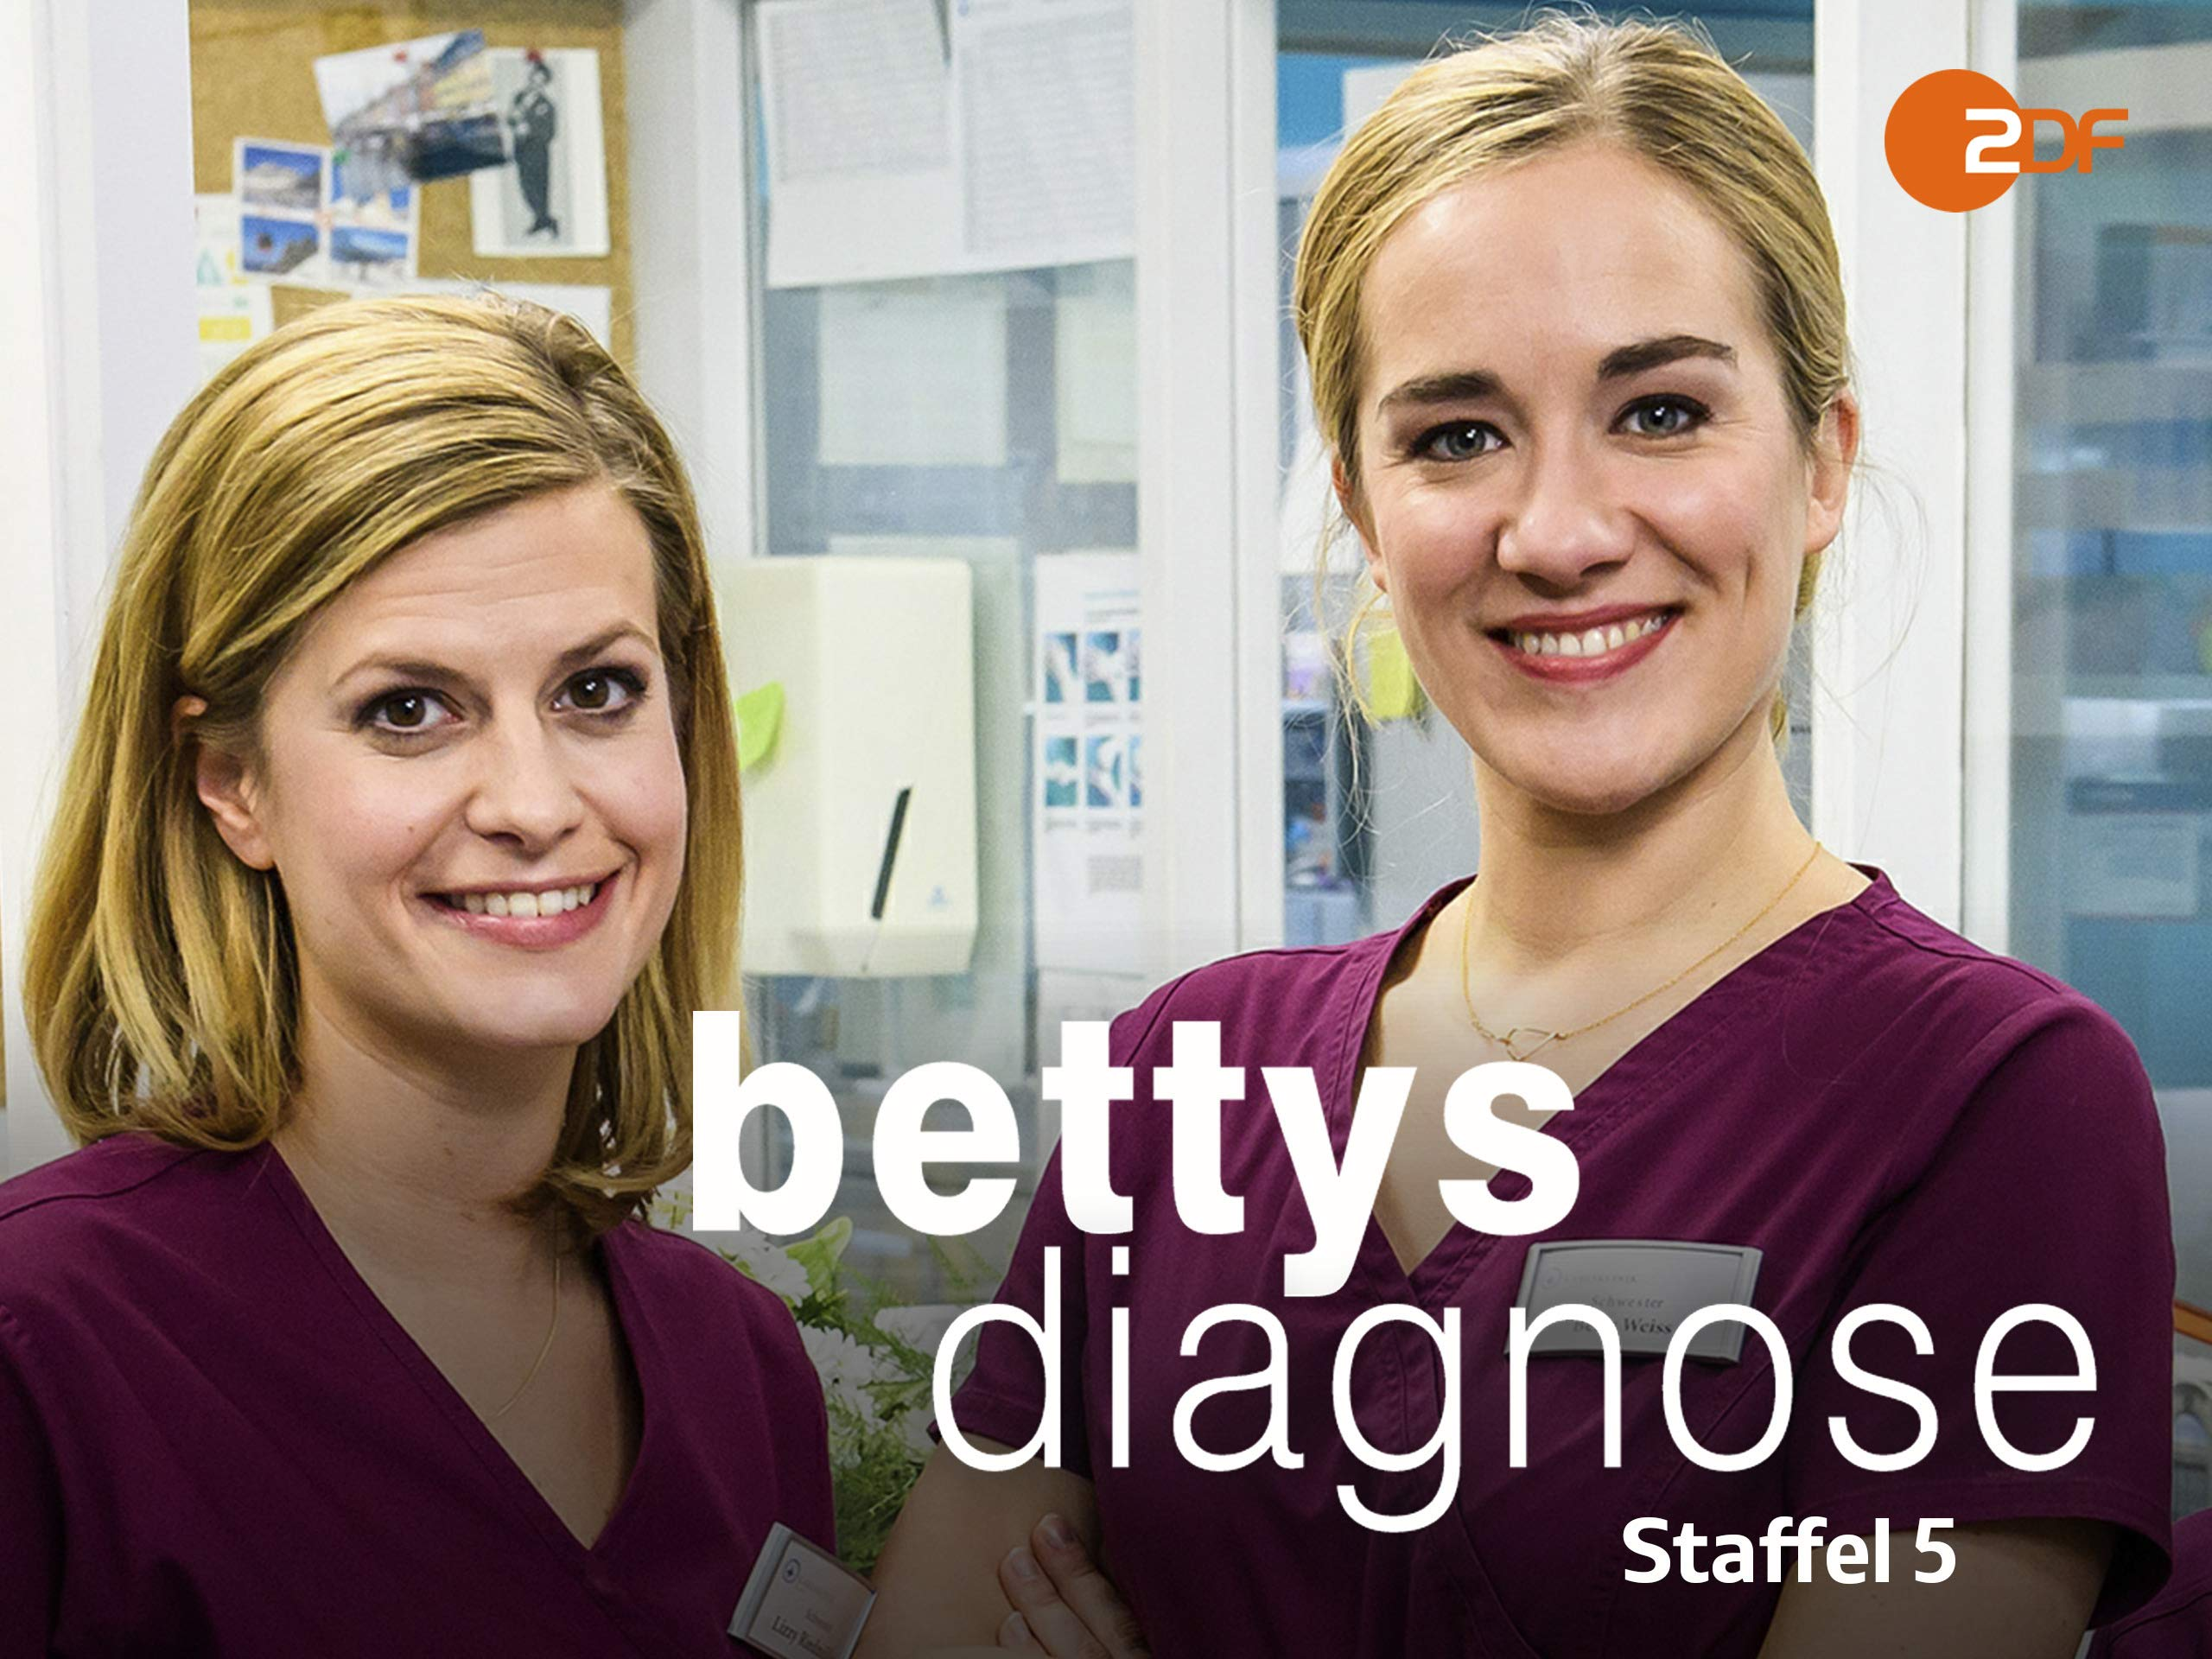 Bettys diagnose staffel 5 folge 18